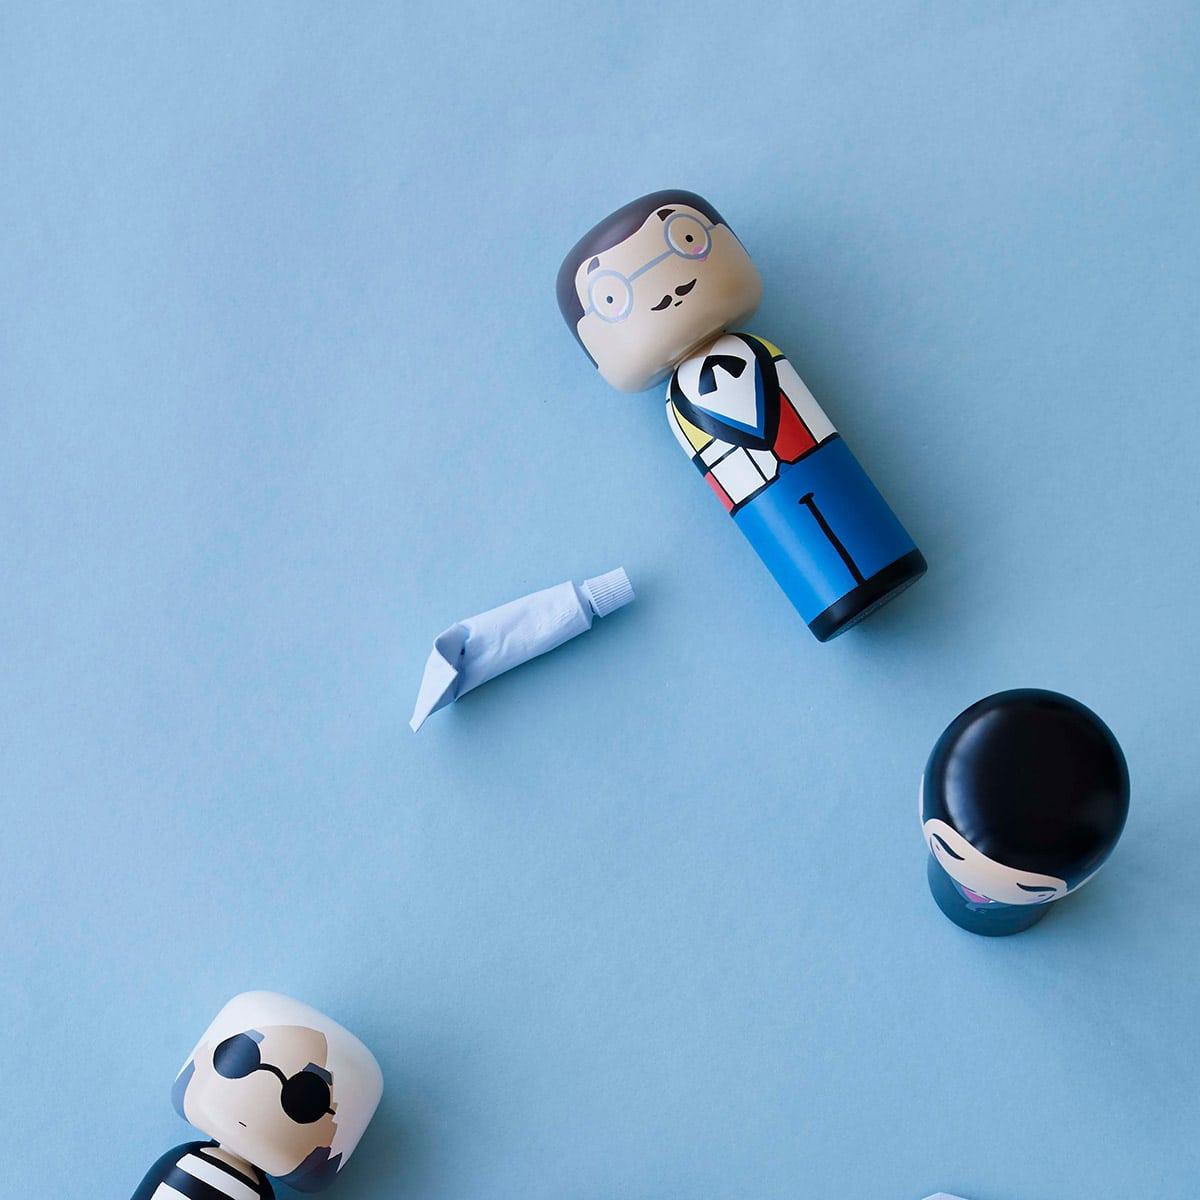 Figurine bois Piet Mondrian, Lucie Kaas